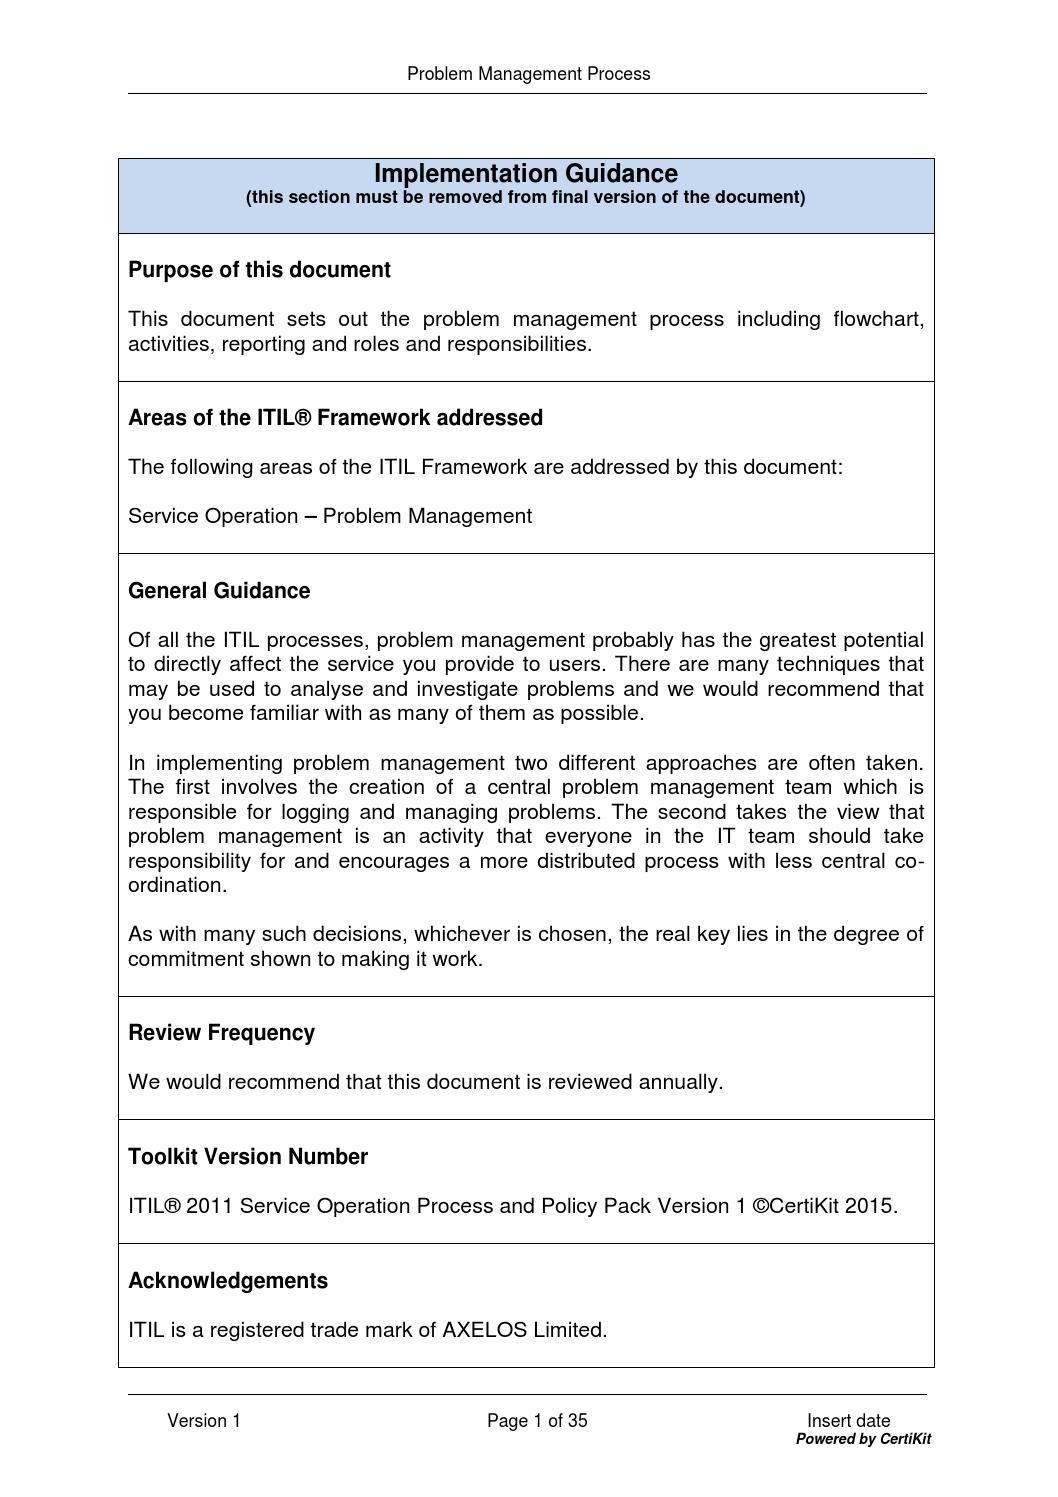 Problem Management: Itilso0402 Problem Management Process By CertiKit Limited